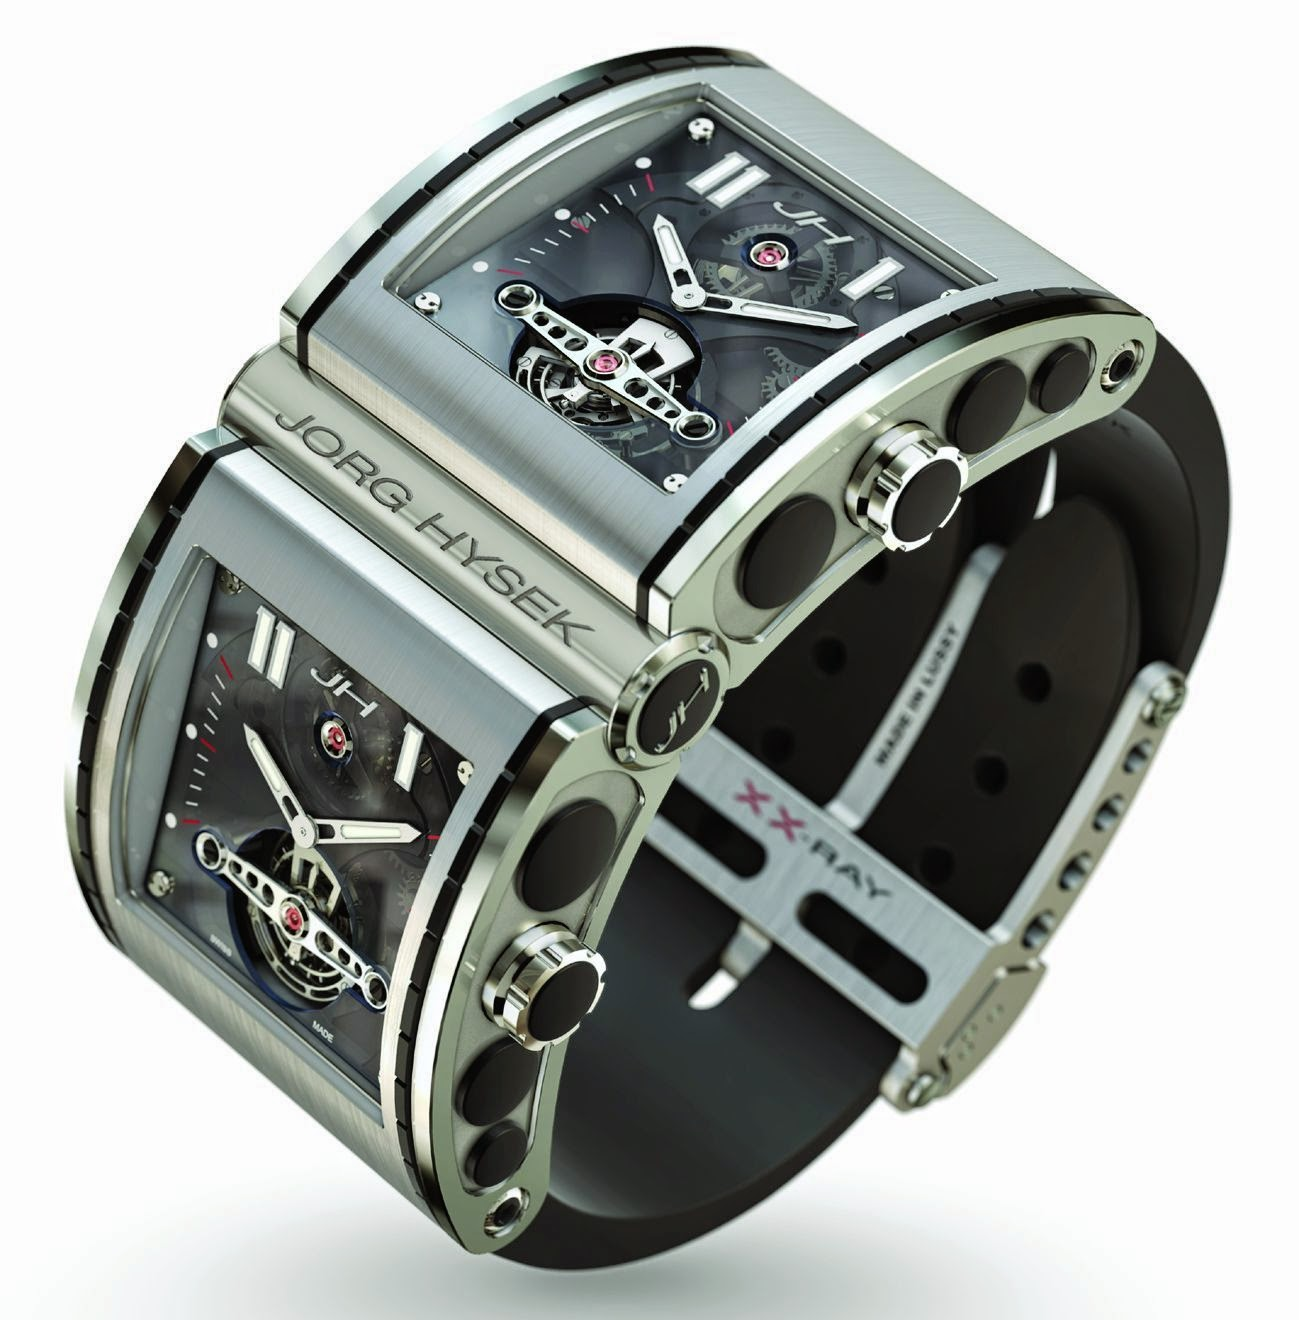 JORG HYSEK XX-Ray automatic two tourbillon watch